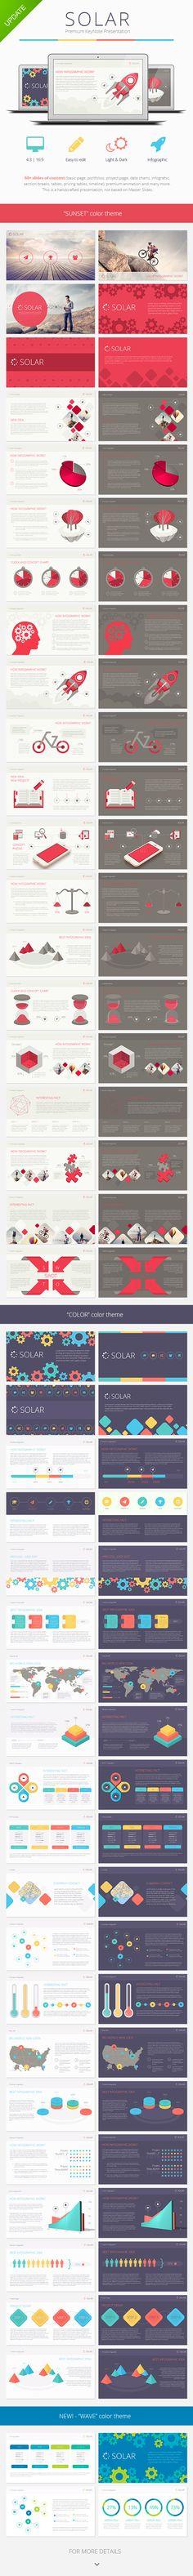 Solar Keynote Presentation Template  #social media #social networks #solar • Available here → http://graphicriver.net/item/solar-keynote-presentation-template/8208898?s_rank=42&ref=pxcr